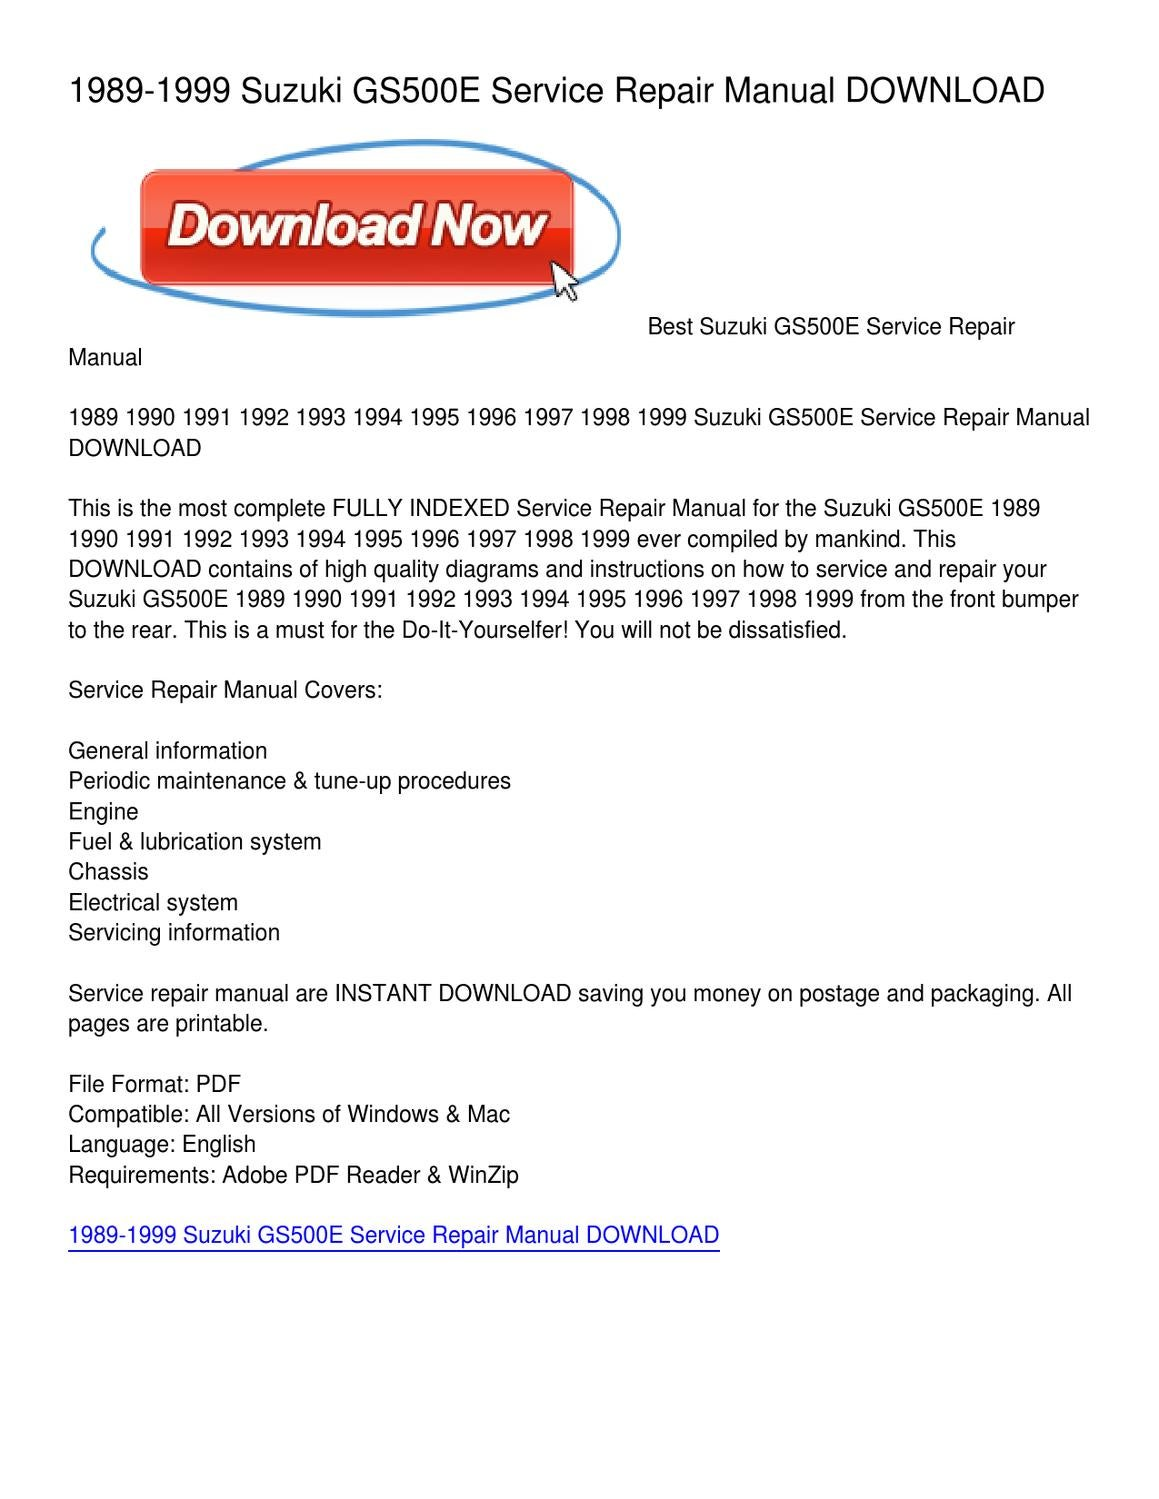 1989-1999 Suzuki GS500E Service Repair Manual DOWNLOAD by Kimberly Fisher -  issuu